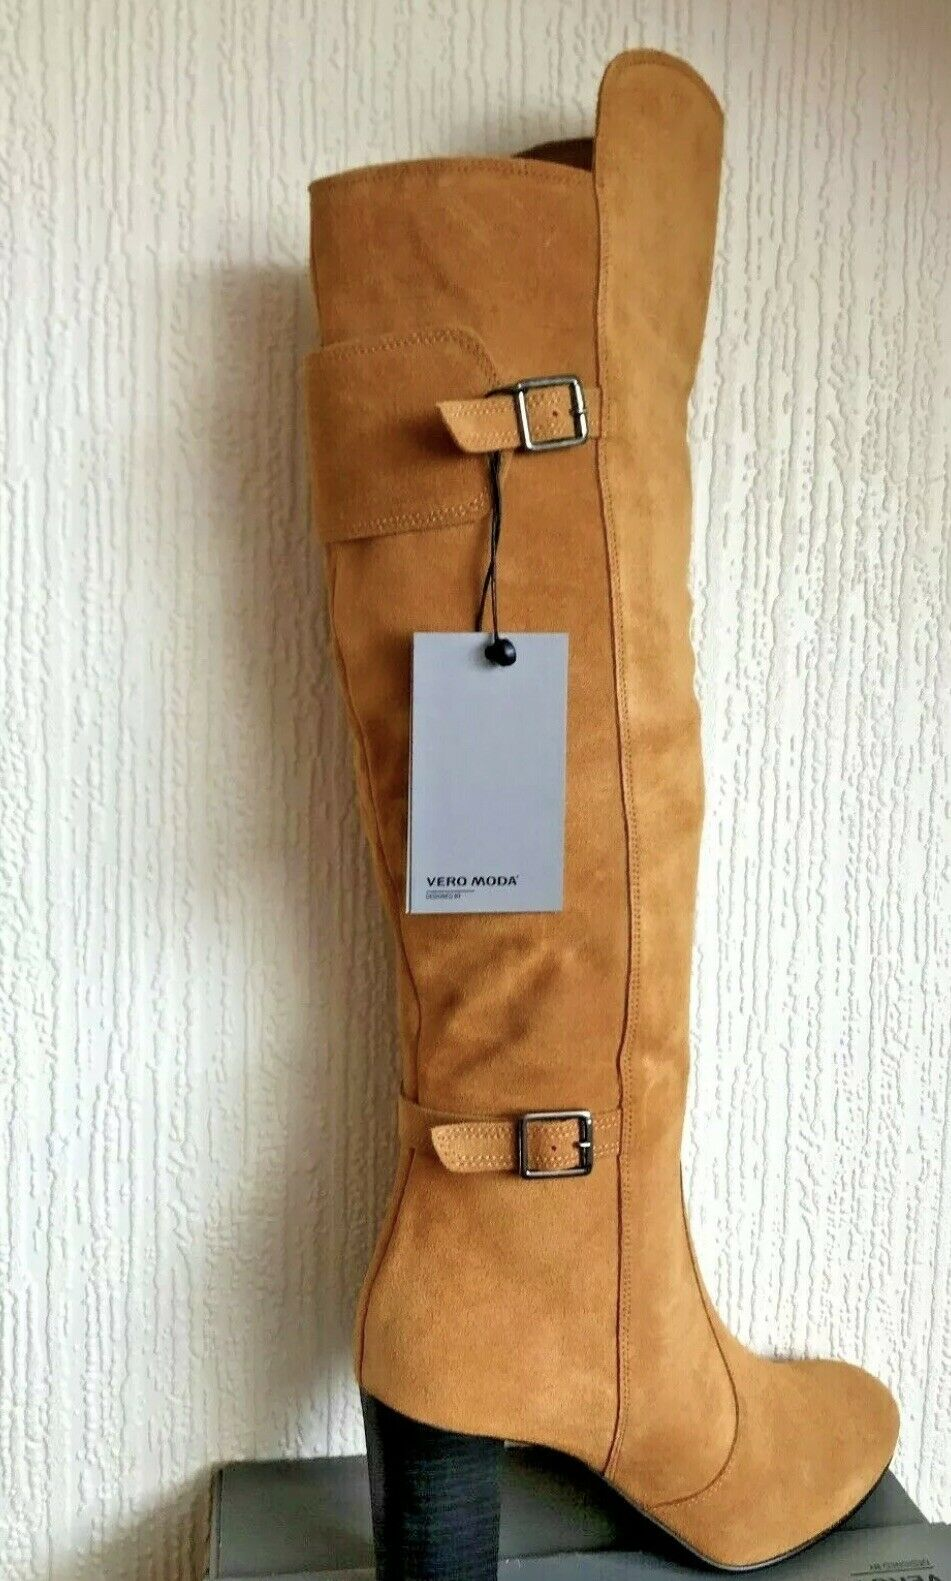 Vero Moda Kelly Cognac Suede Leather Women's Designer Boots Size